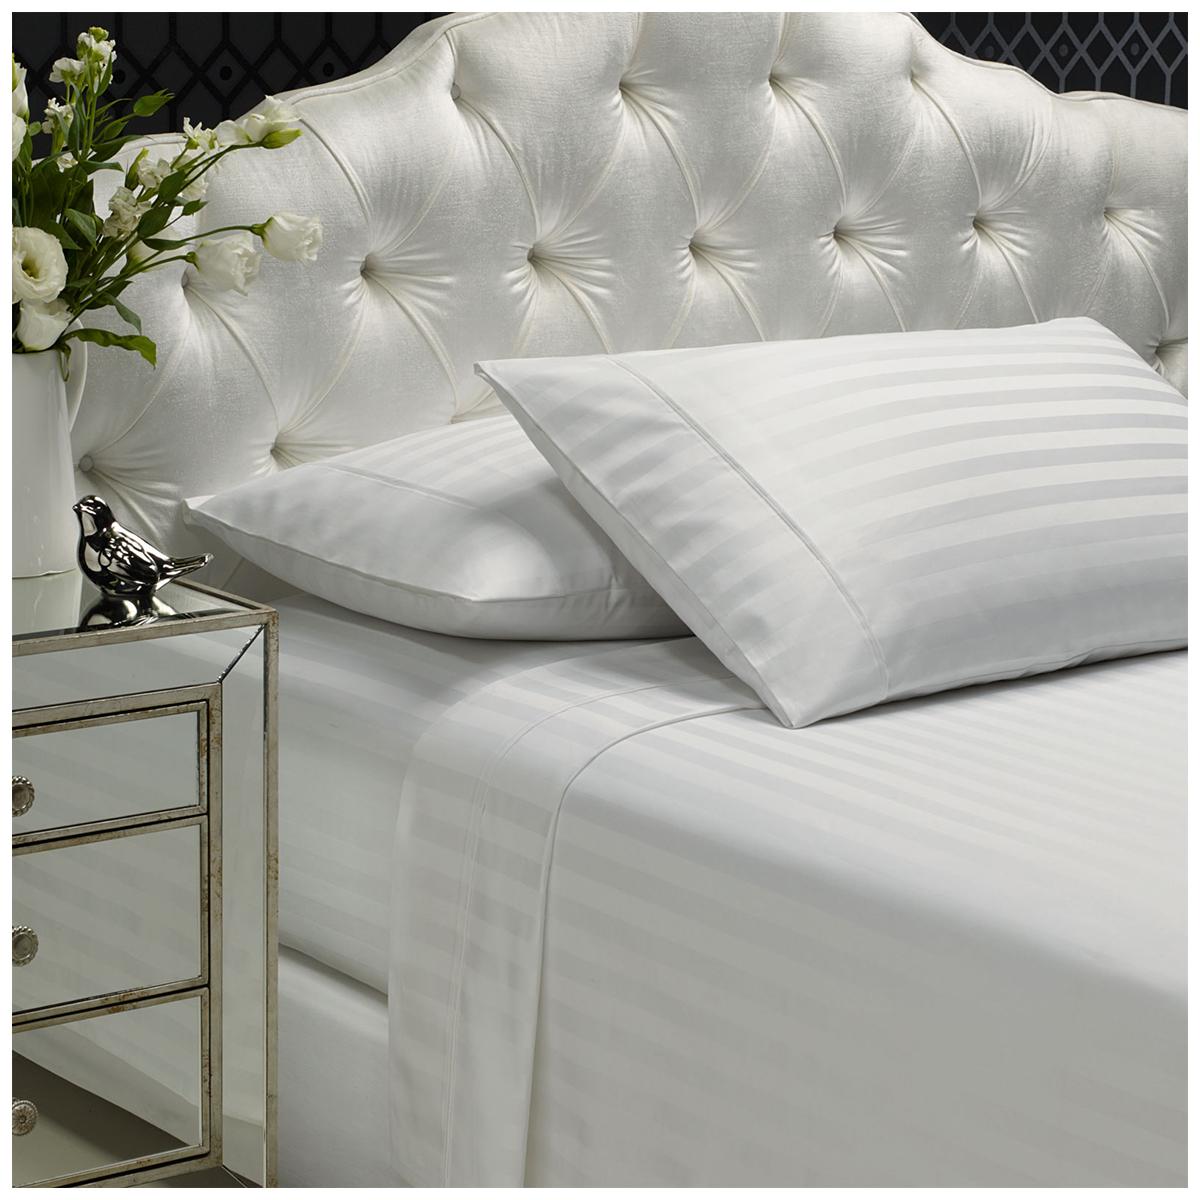 Royal Comfort 1200 Thread Count Damask Stripe Sheet Set Queen White Costco Australia